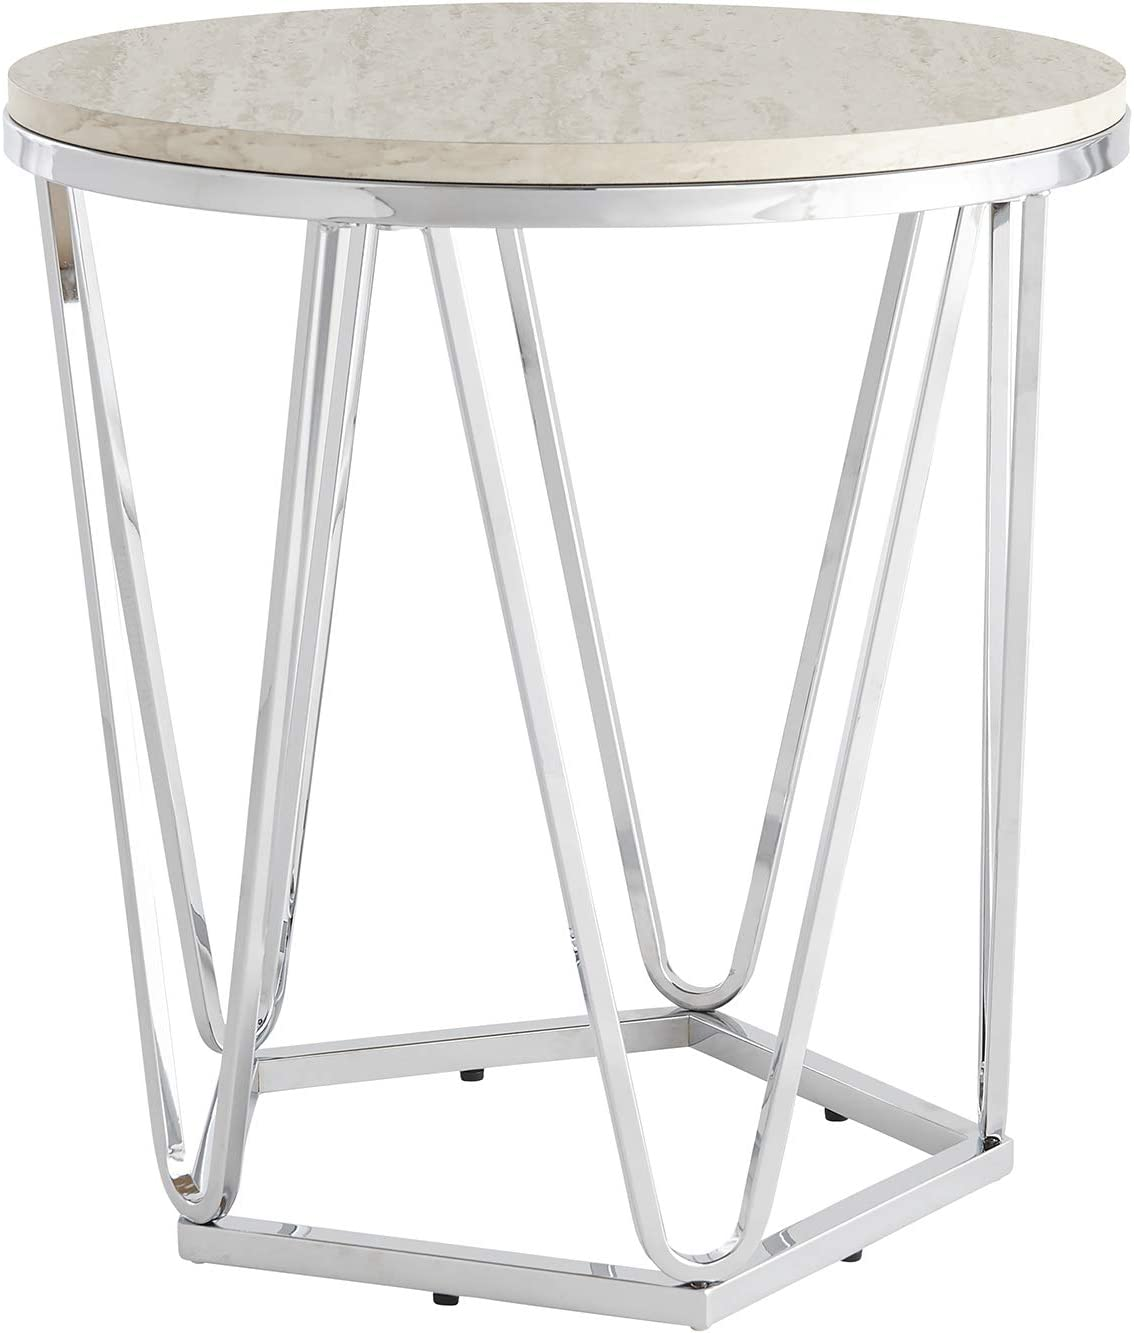 Southern Enterprises Max 73% OFF Luna Large-scale sale end Silver table faux travertine